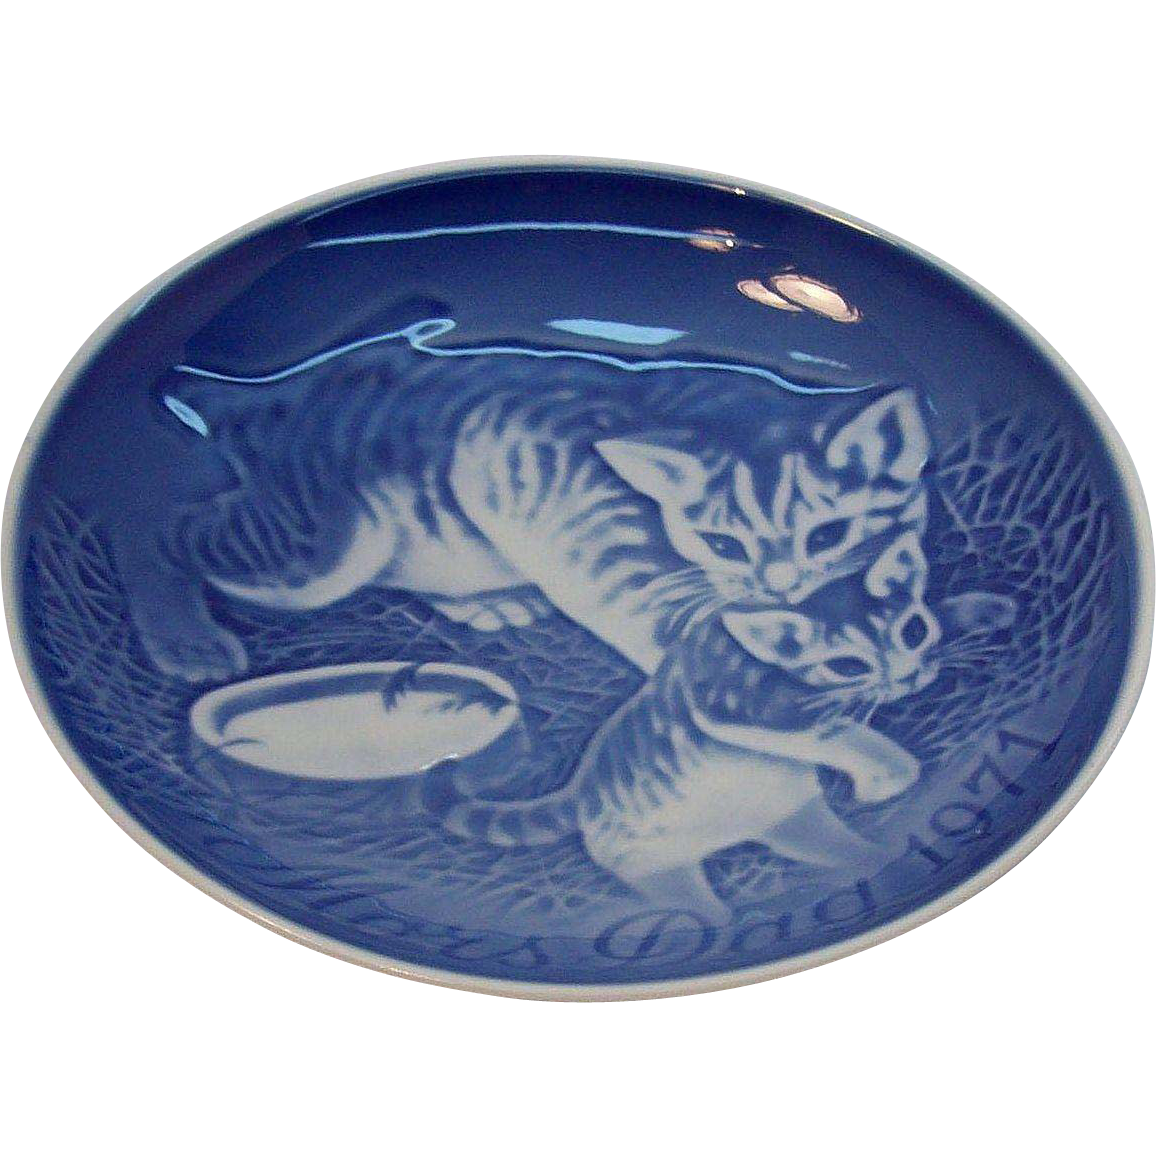 Mother Cat & Kitten 1971 Bing & Grondahl Mother's Day Plate